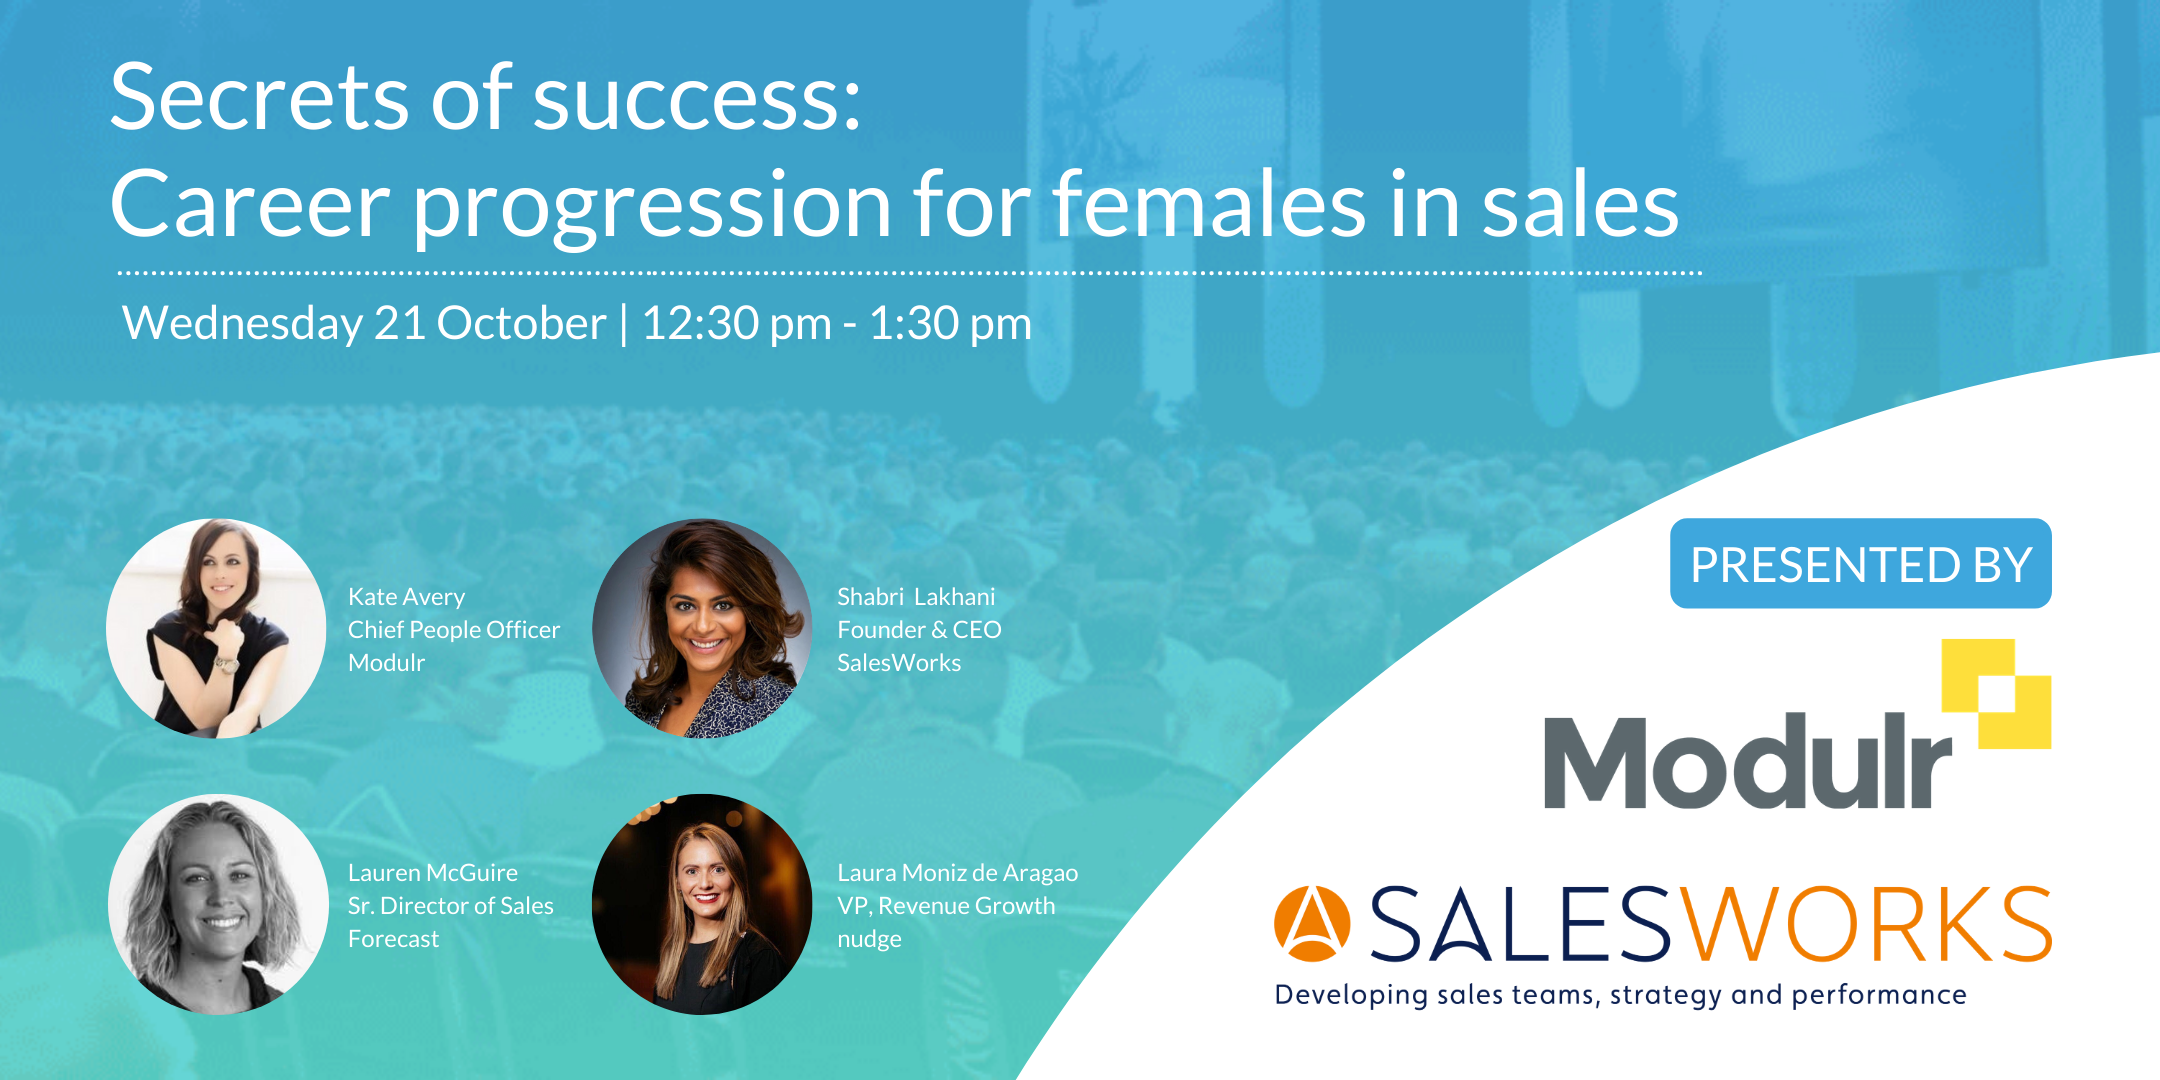 Secrets of success: career progression for females in sales